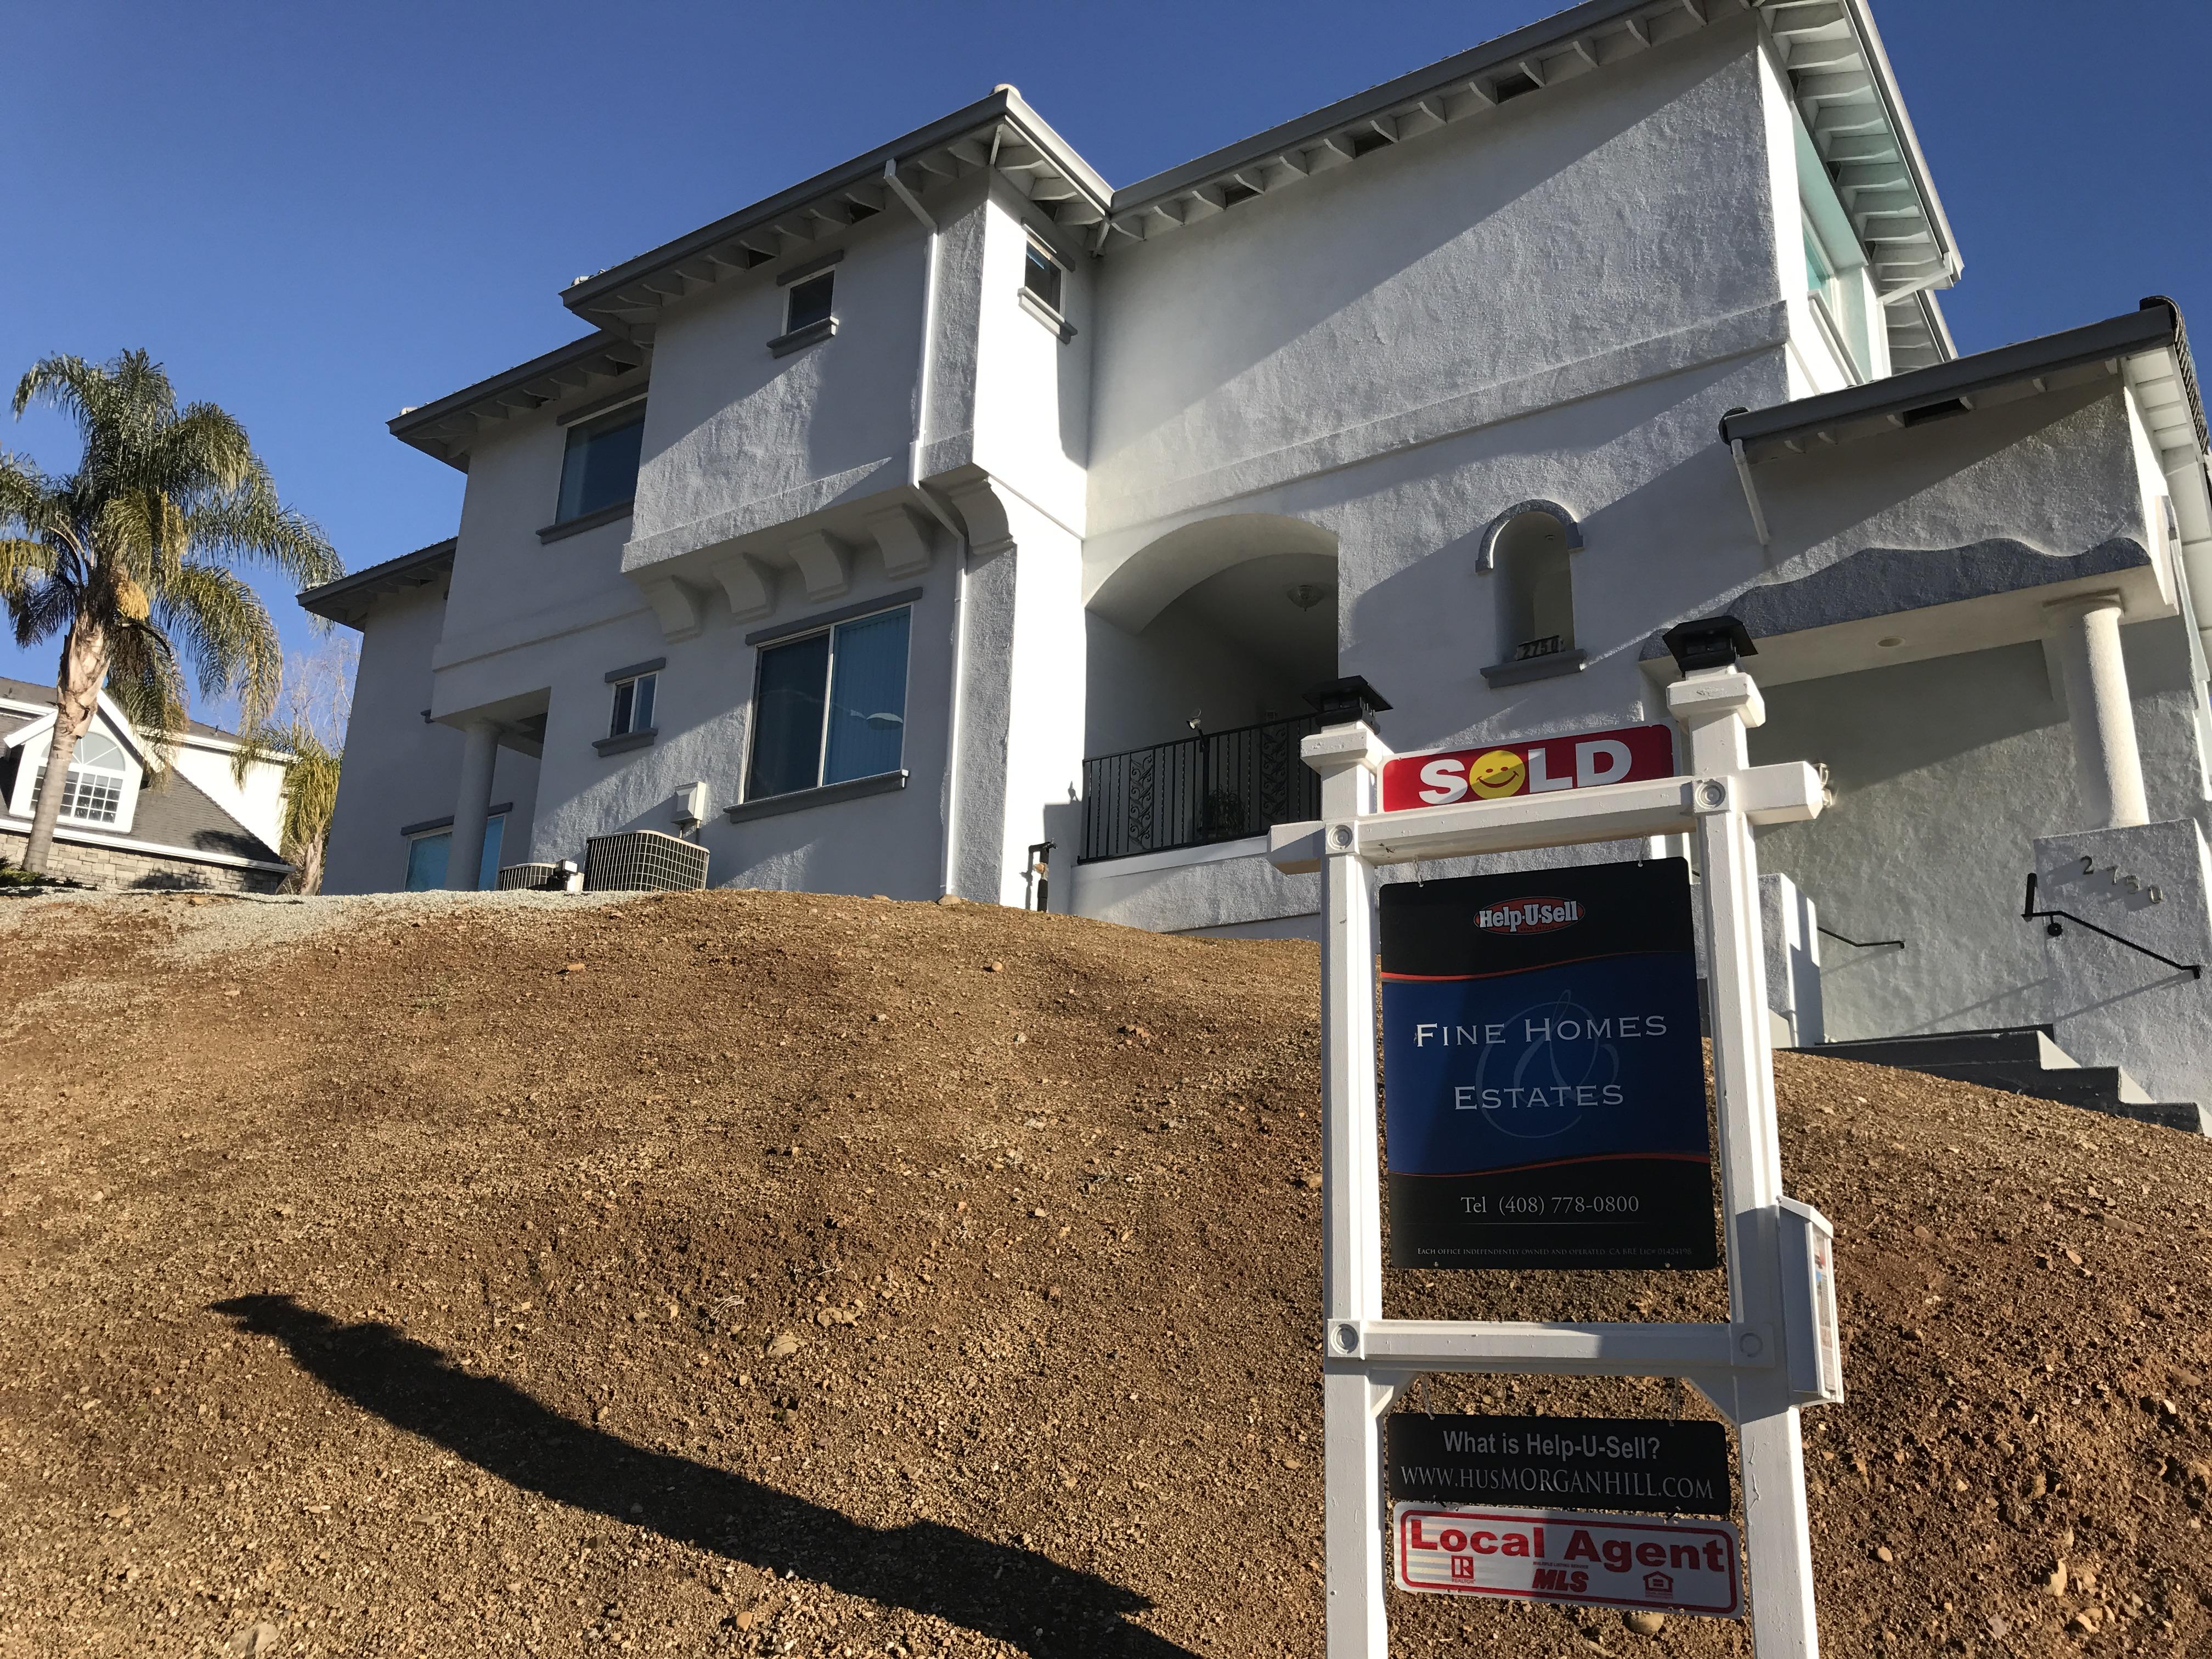 Testimonials - Help-U-Sell South Santa Clara County